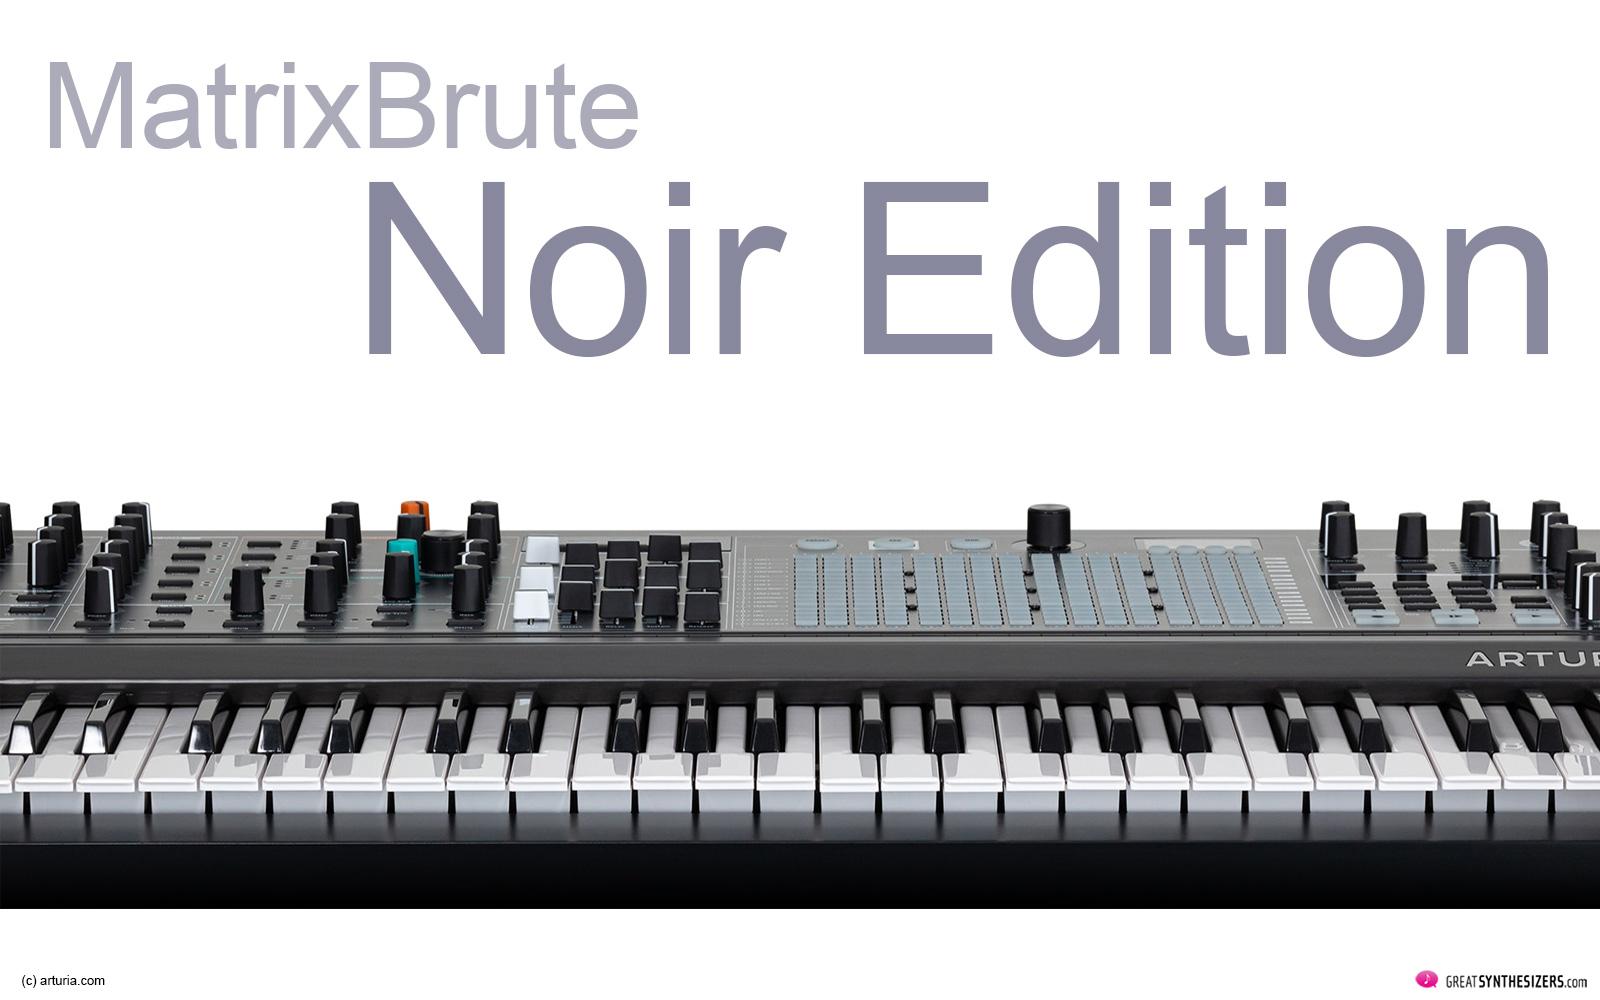 Arturia MatrixBrute Noir Edition